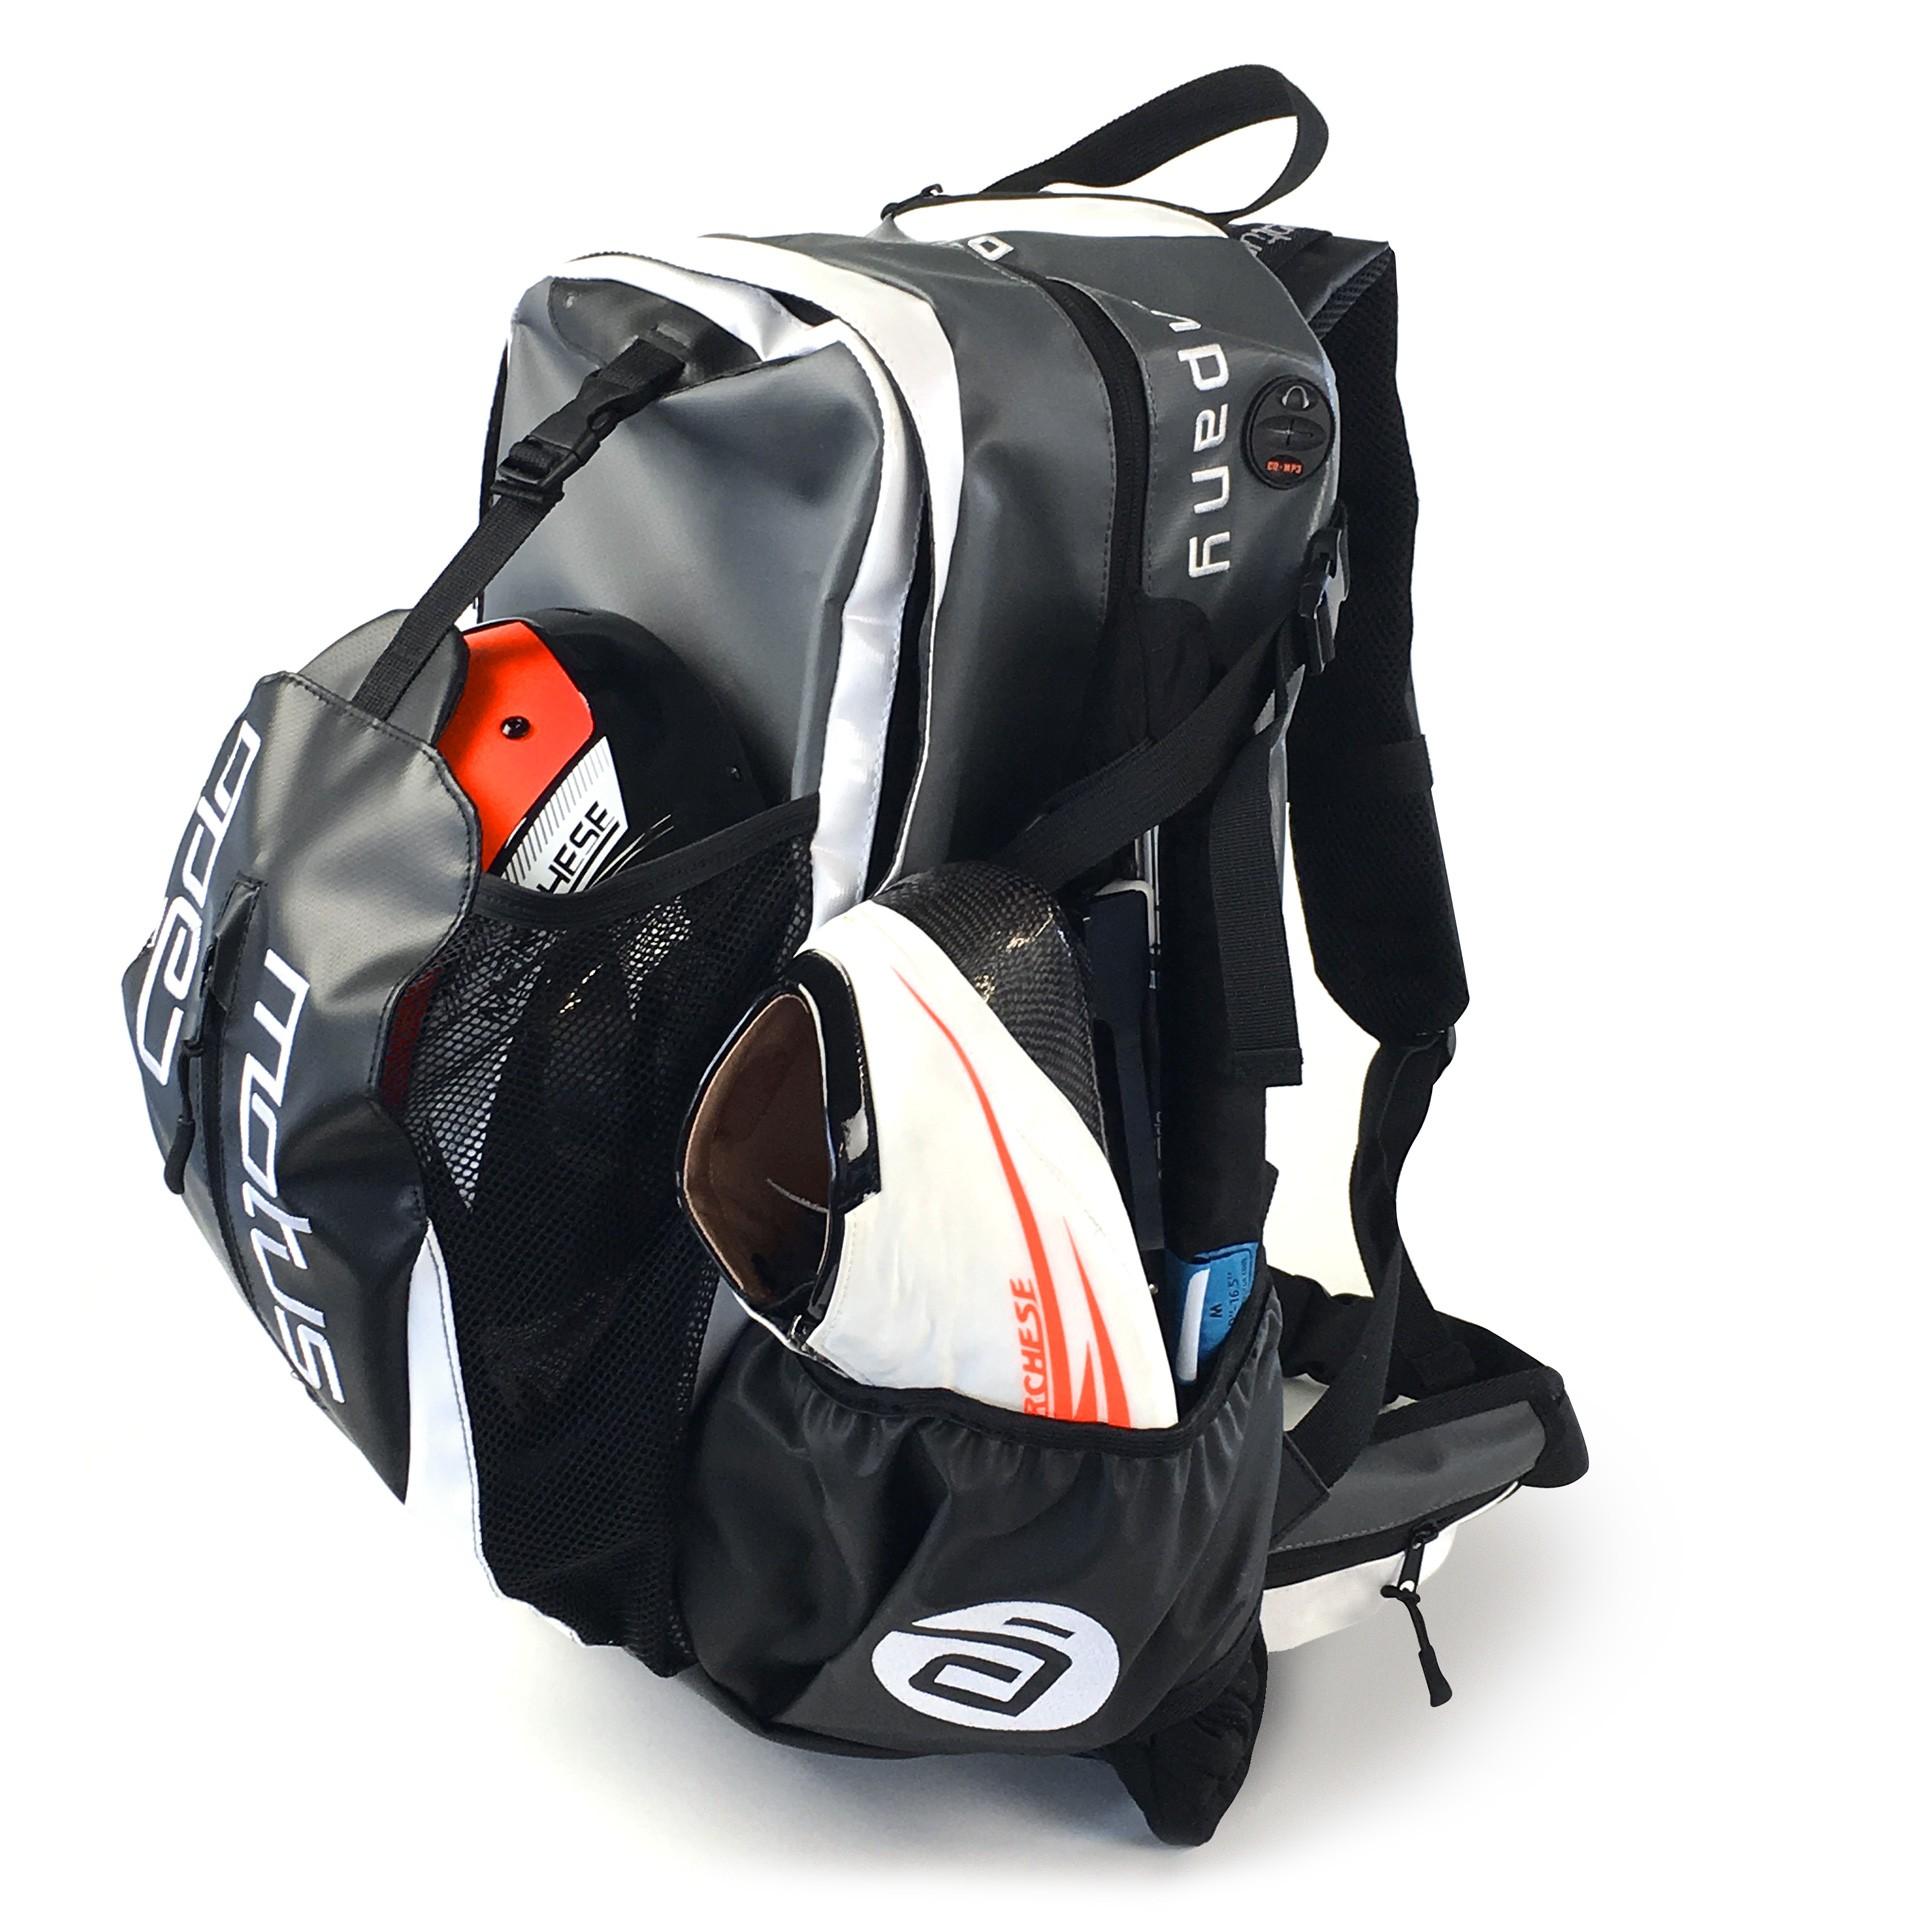 de04dbc9e00 CadoMotus Skate Backpack Waterproof Zwart/Wit bestellen bij Skate ...